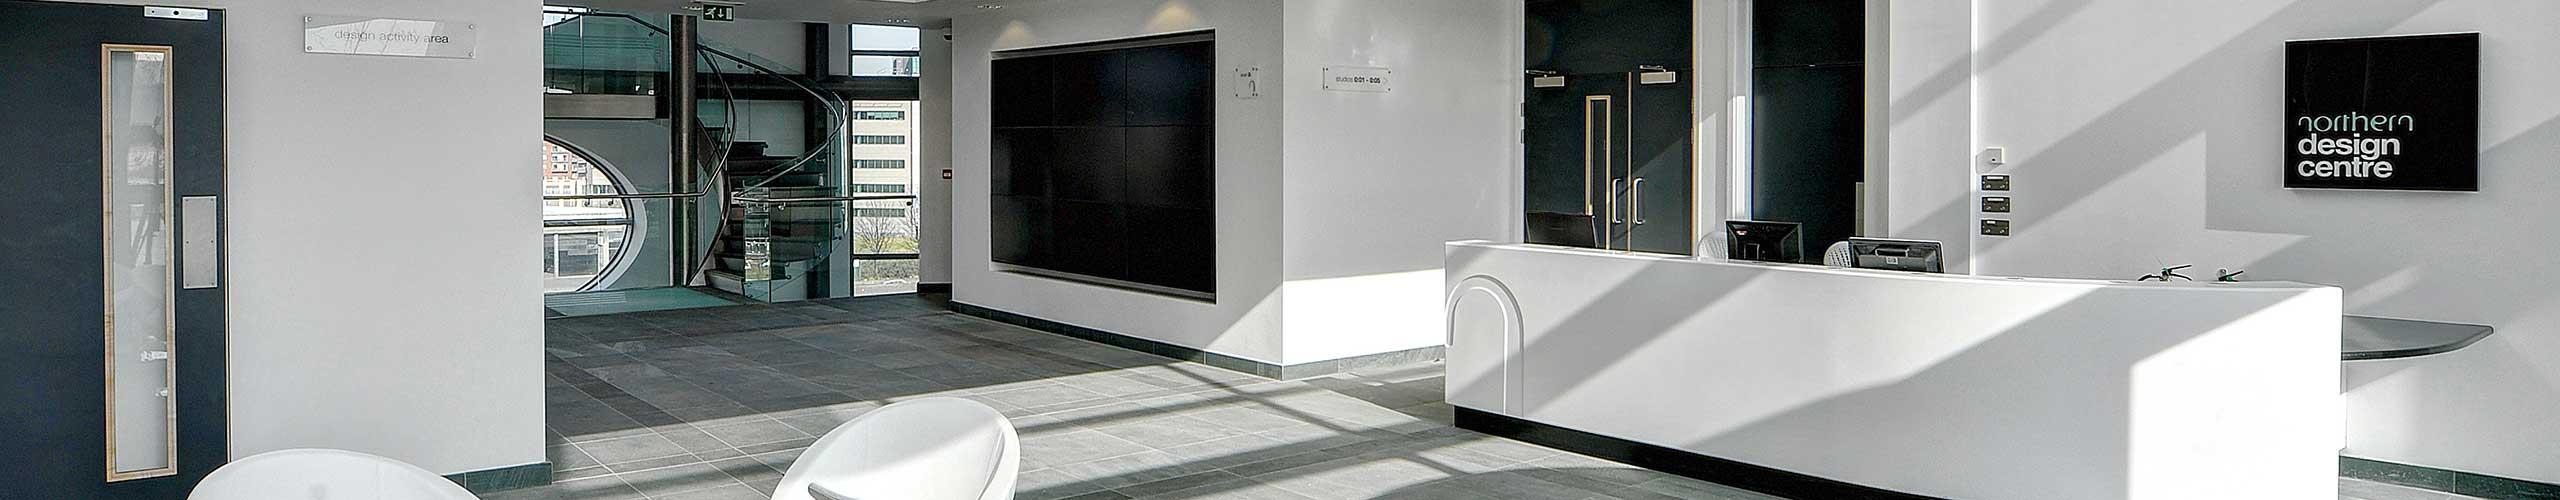 Northern Design Centre reception